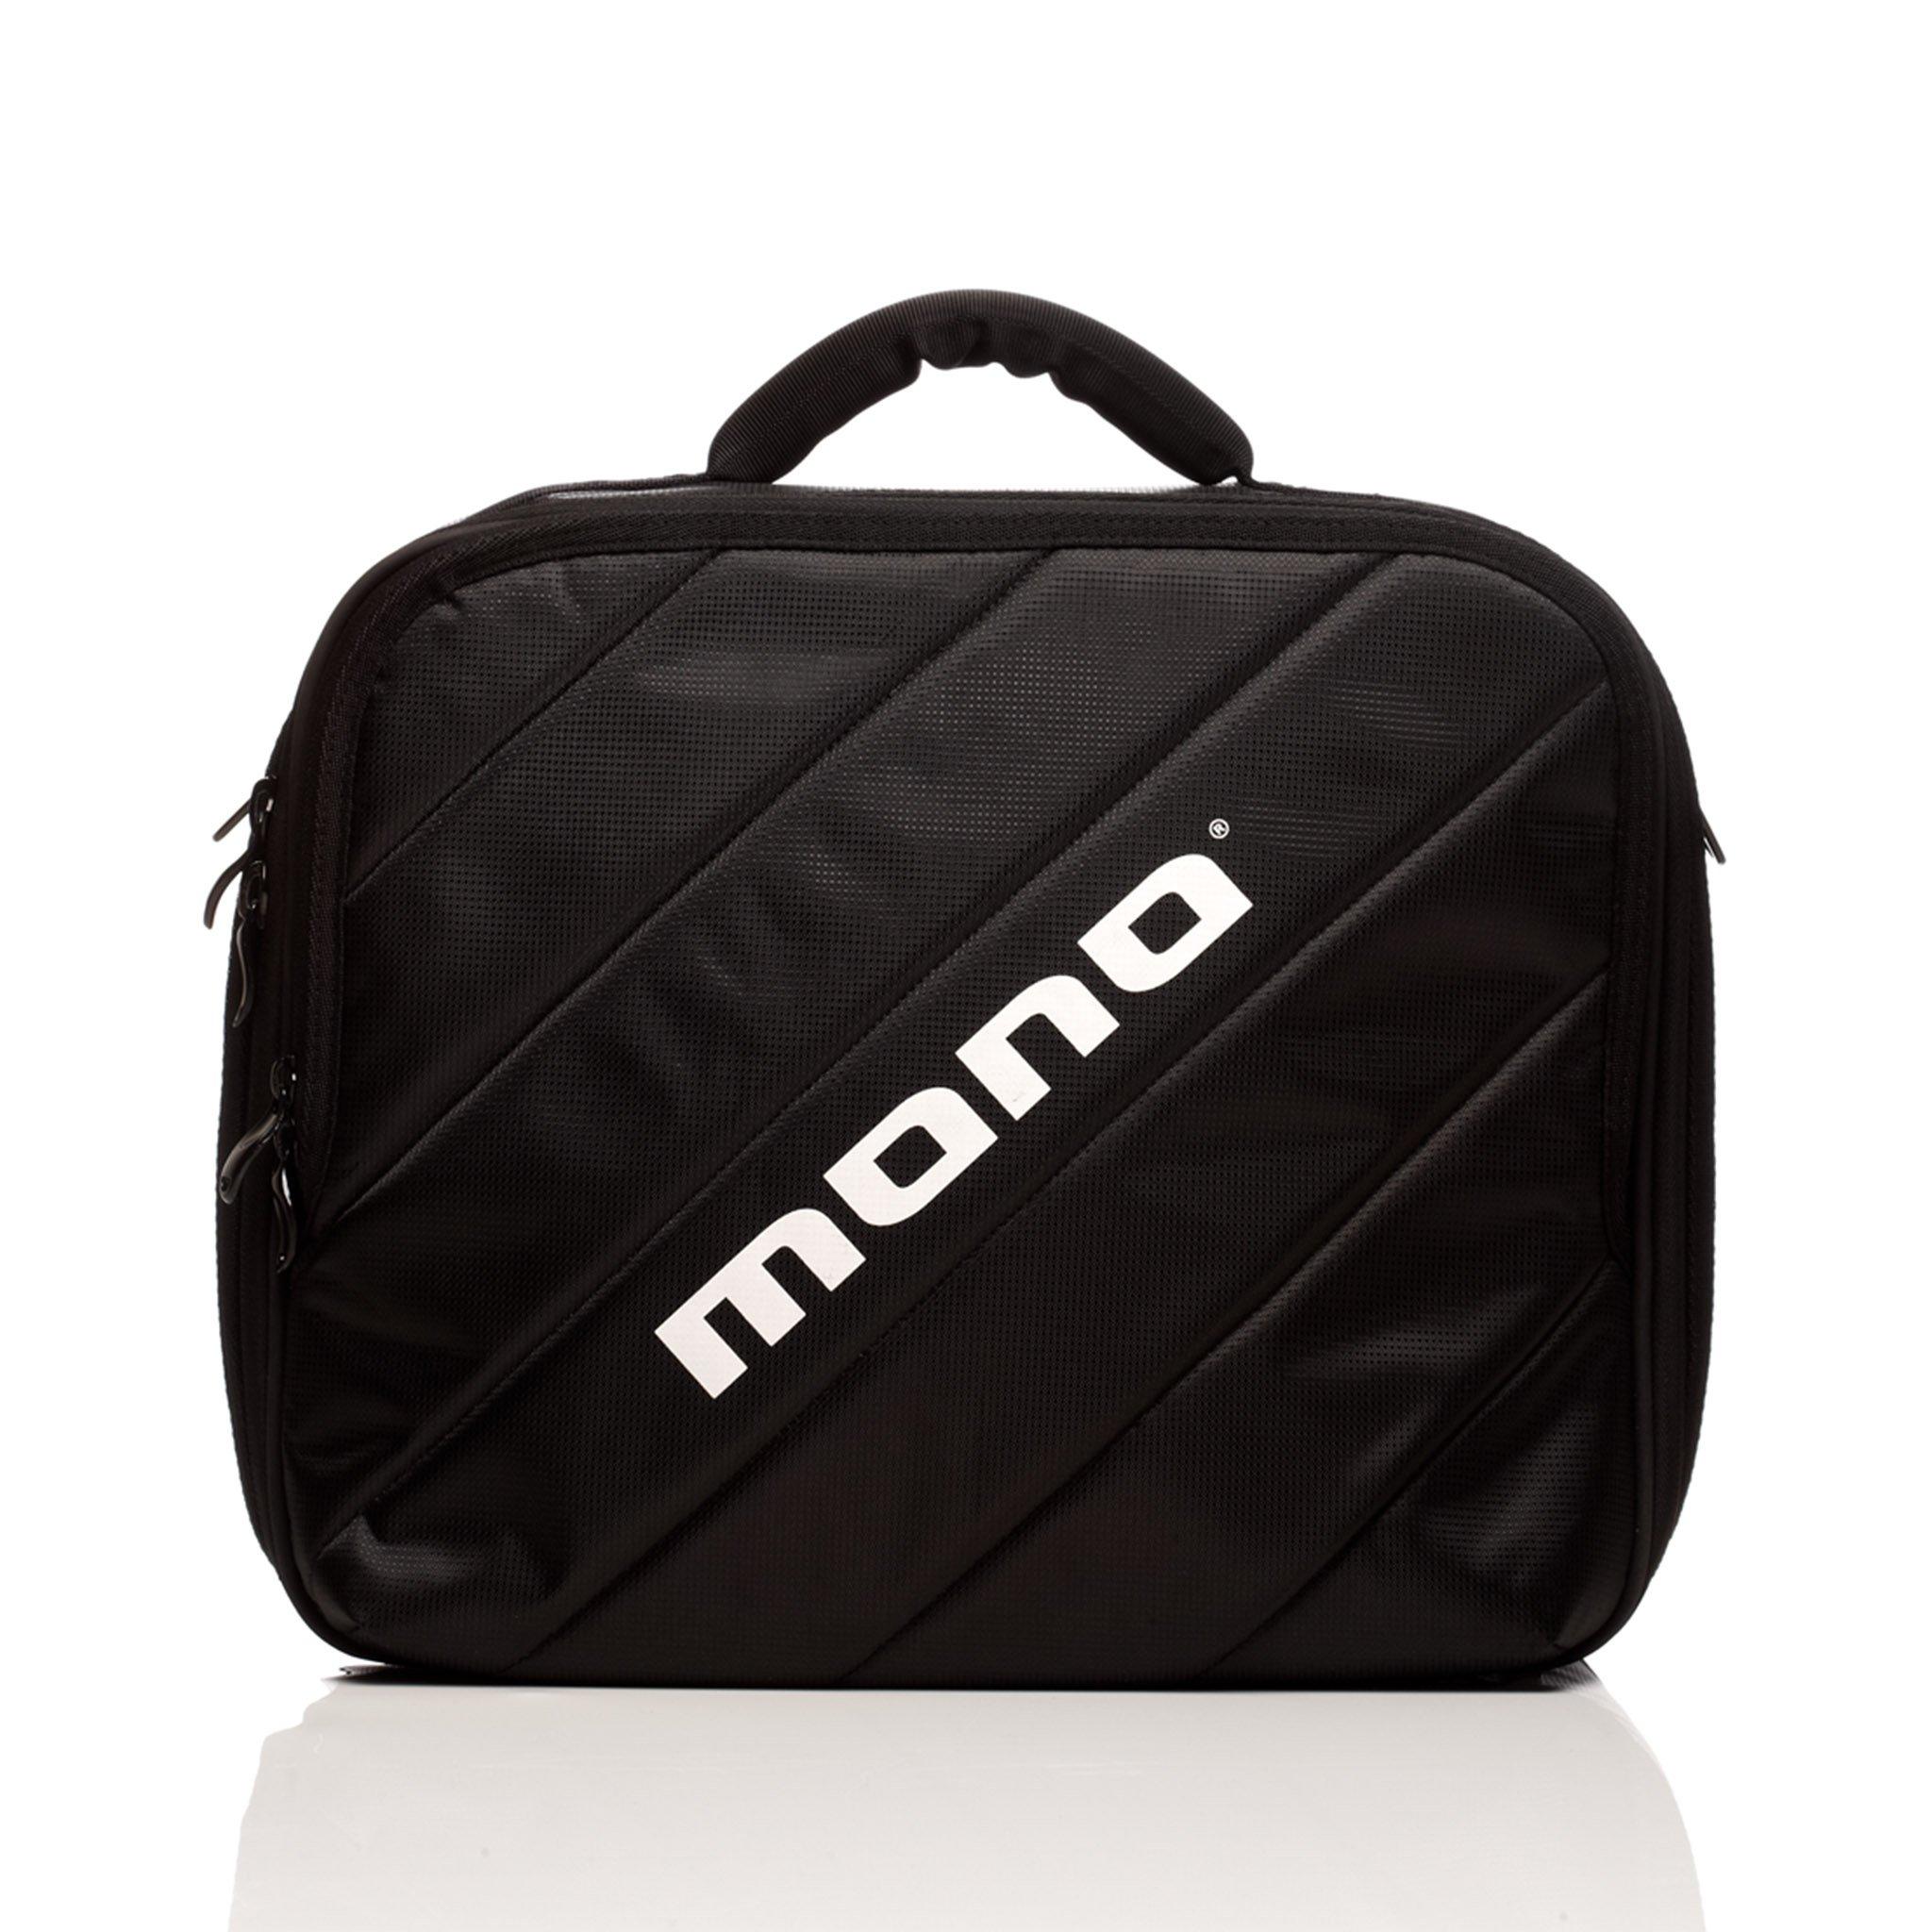 Mono Drum Pedal Case - Black